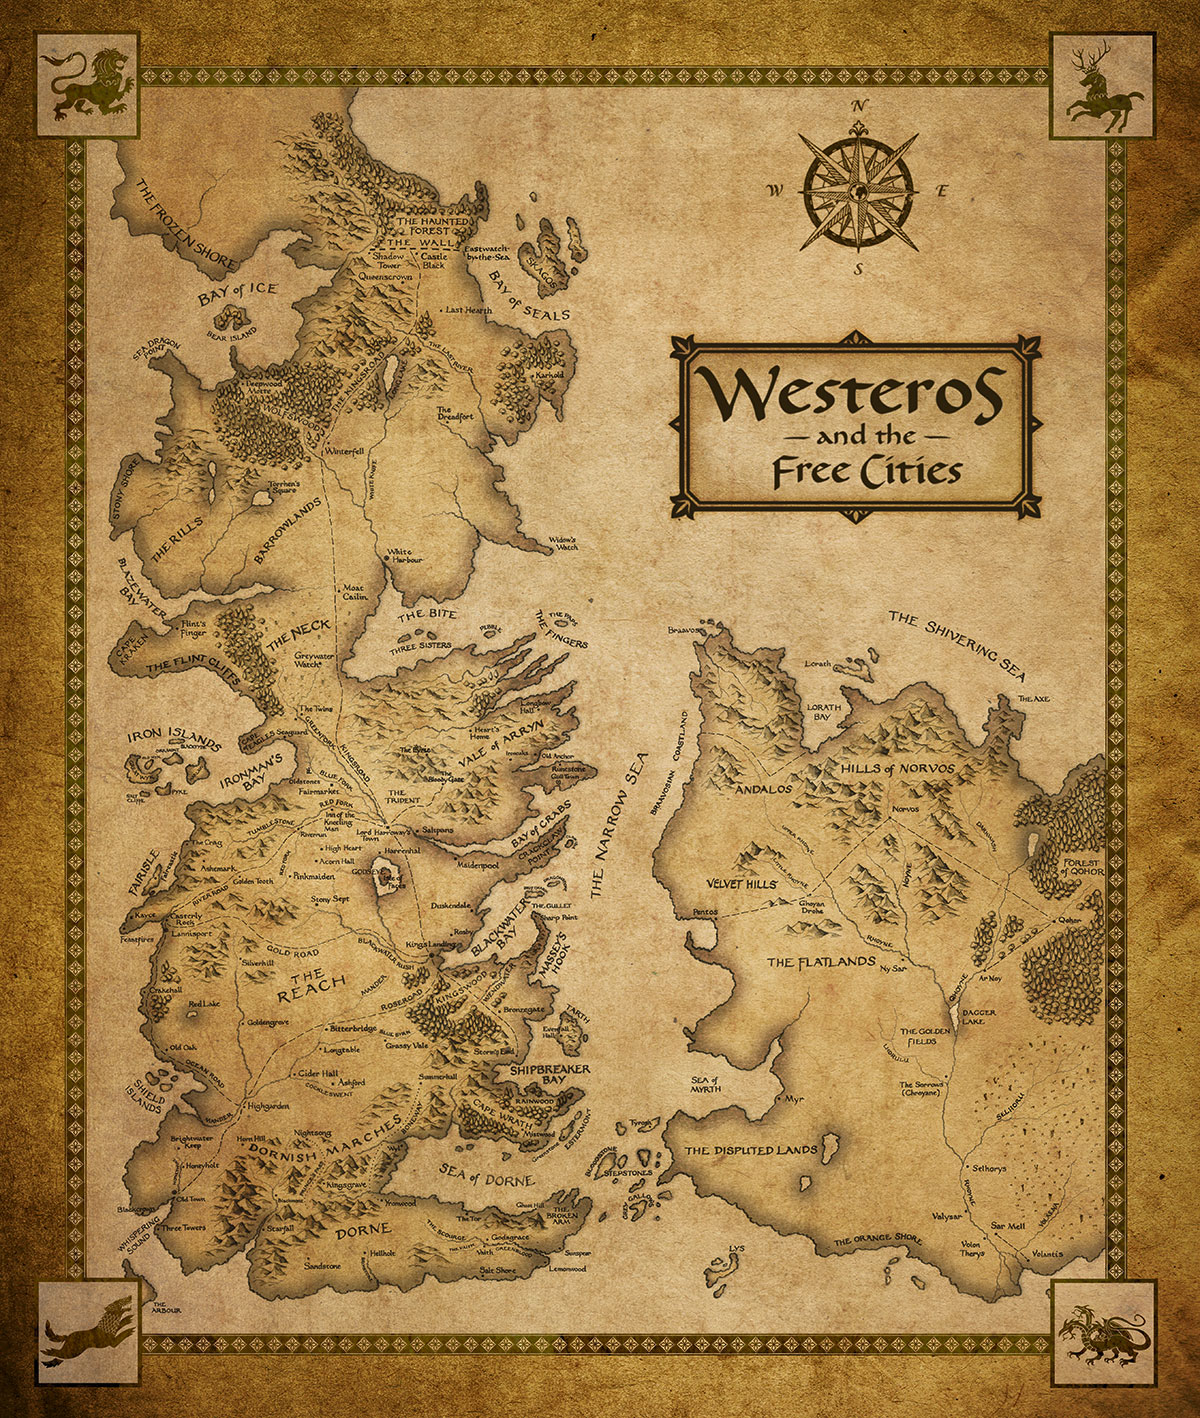 Westeros and Essos new map - Optionated